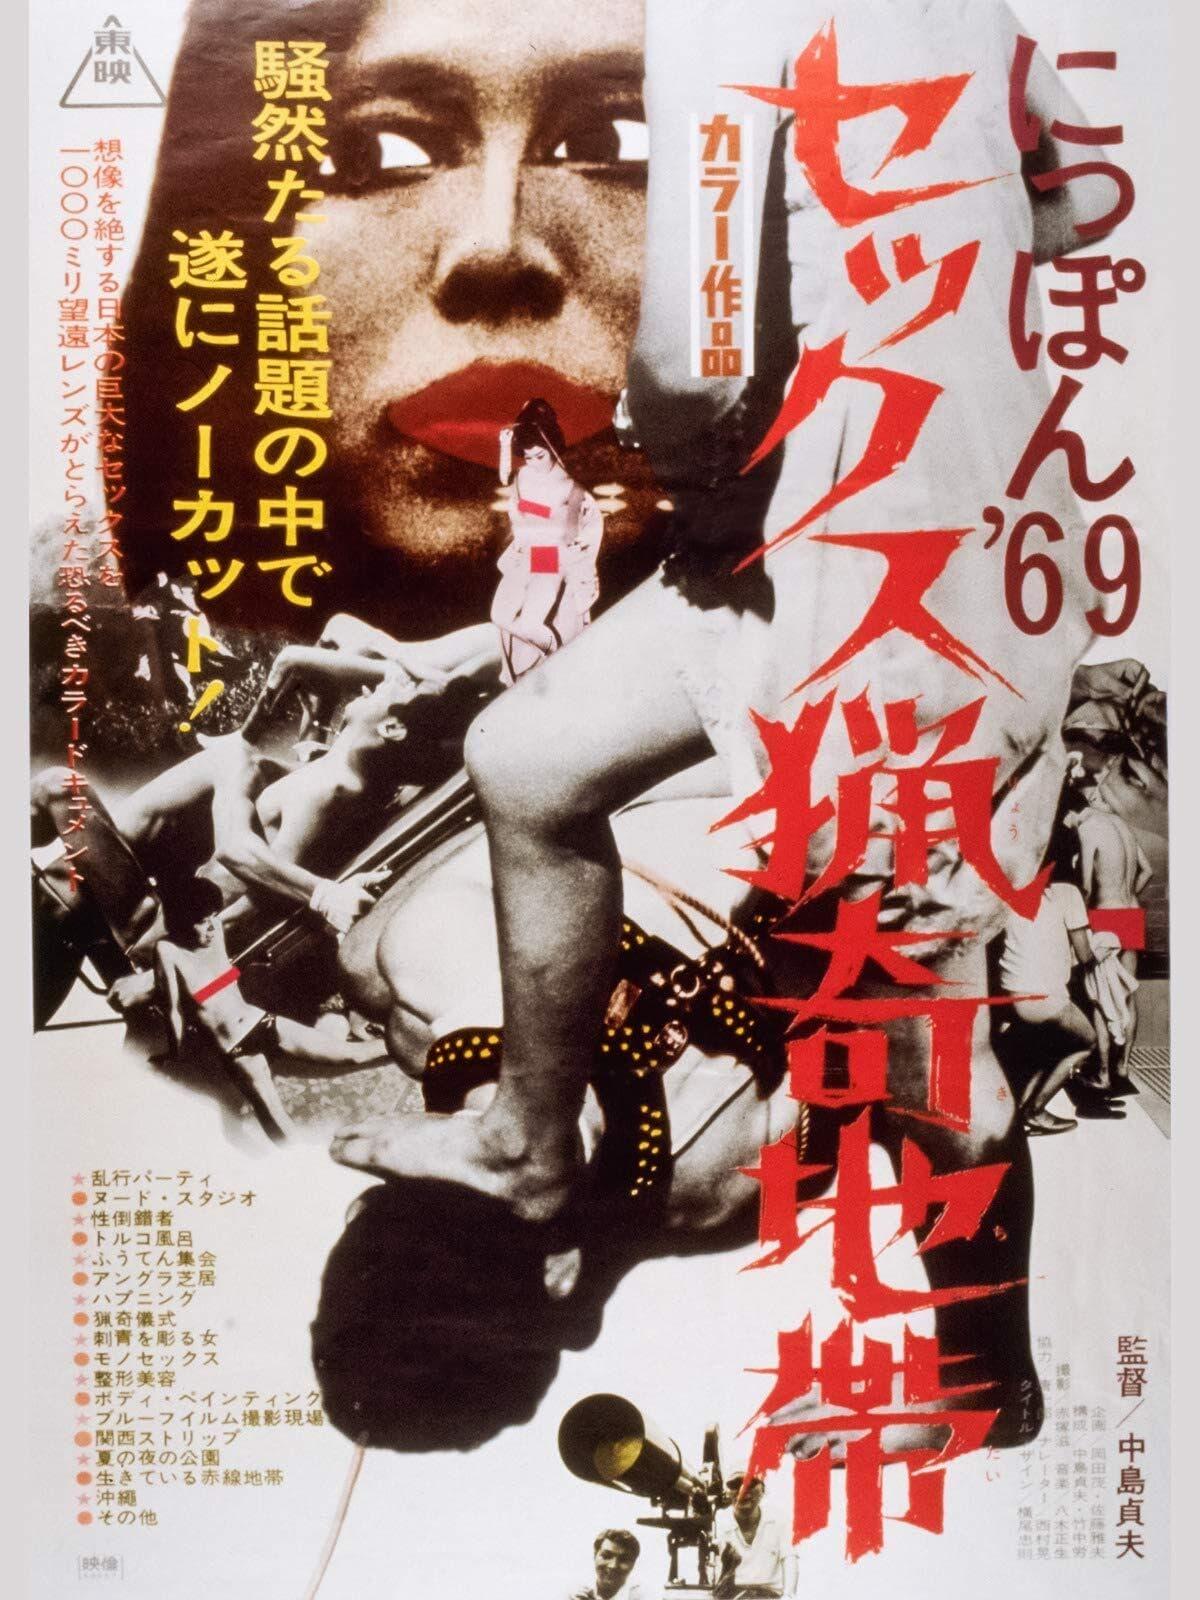 Nippon '69 Sexual Curiosity Seeking Zone